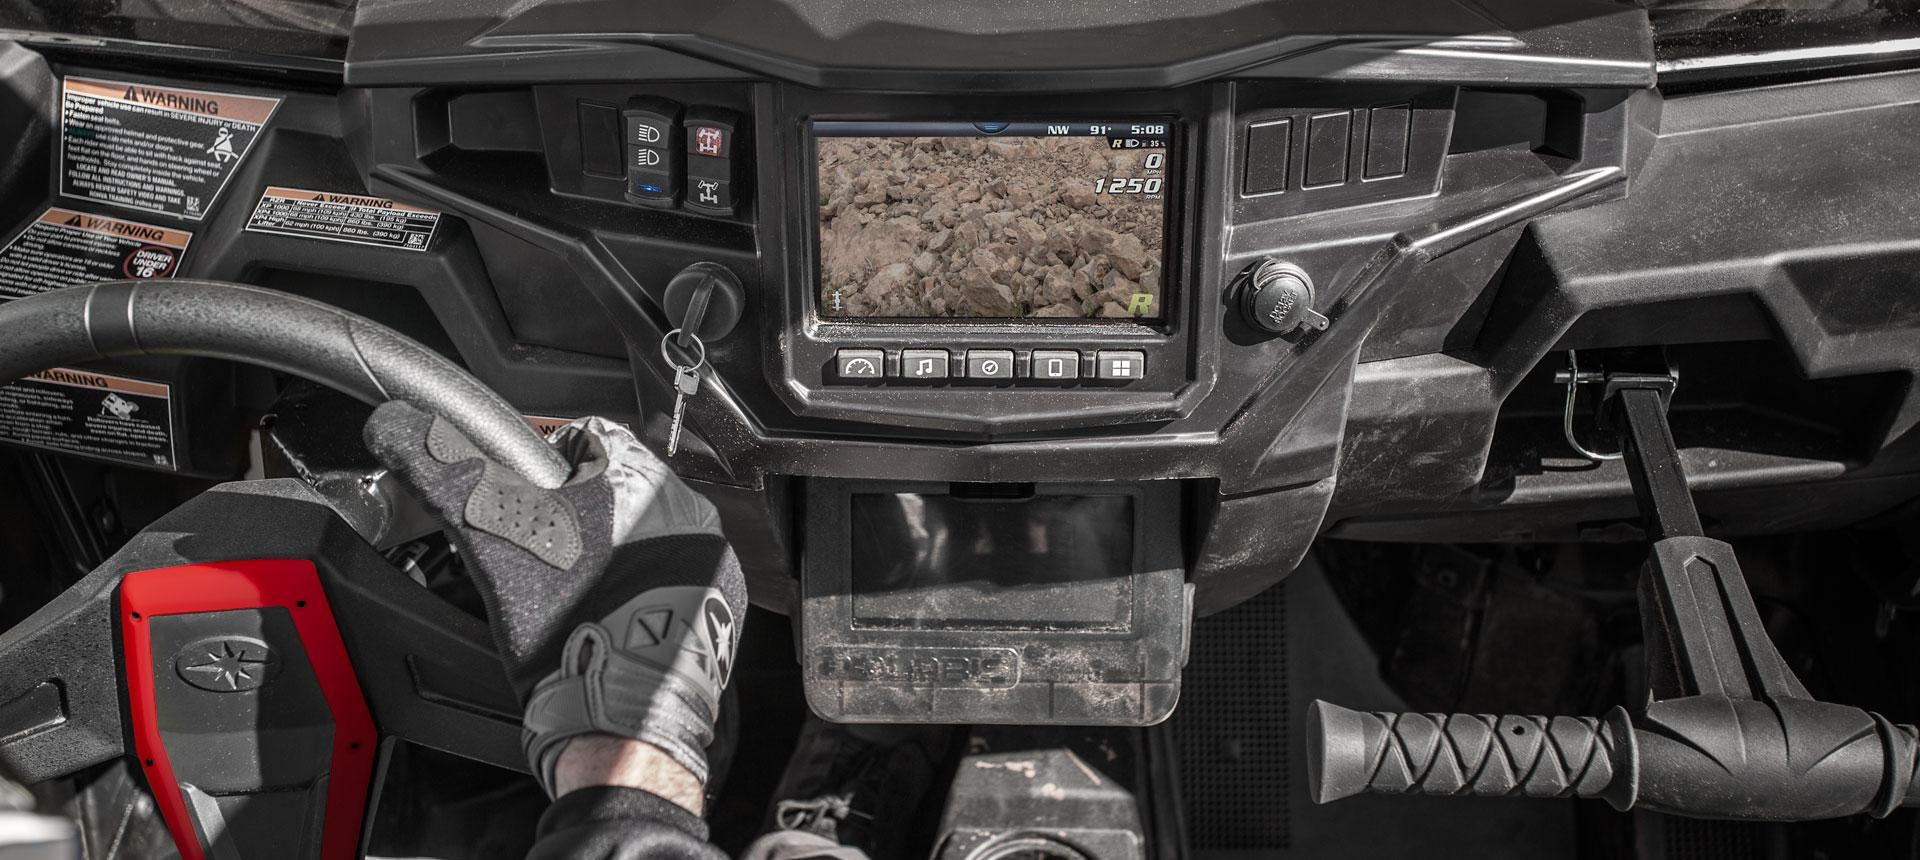 Polaris RZR Turbo Dynamix Edition